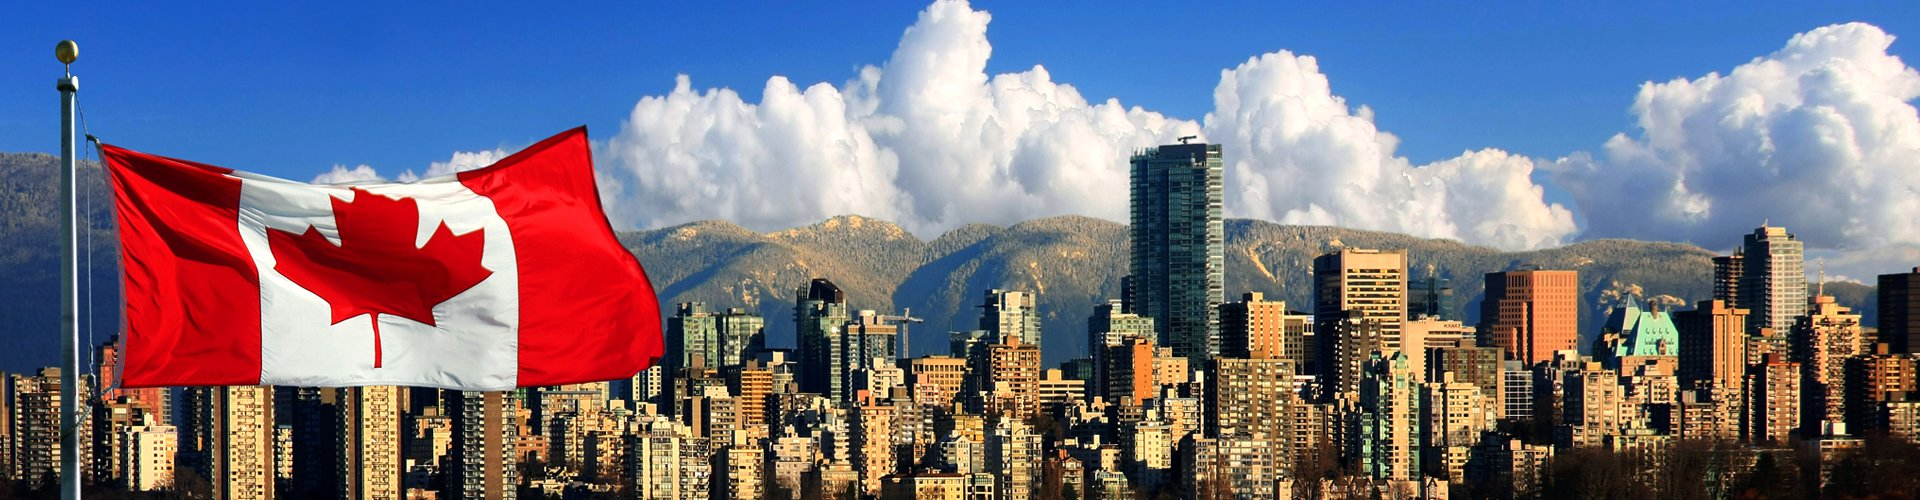 Skyline van Vancouver, Canada